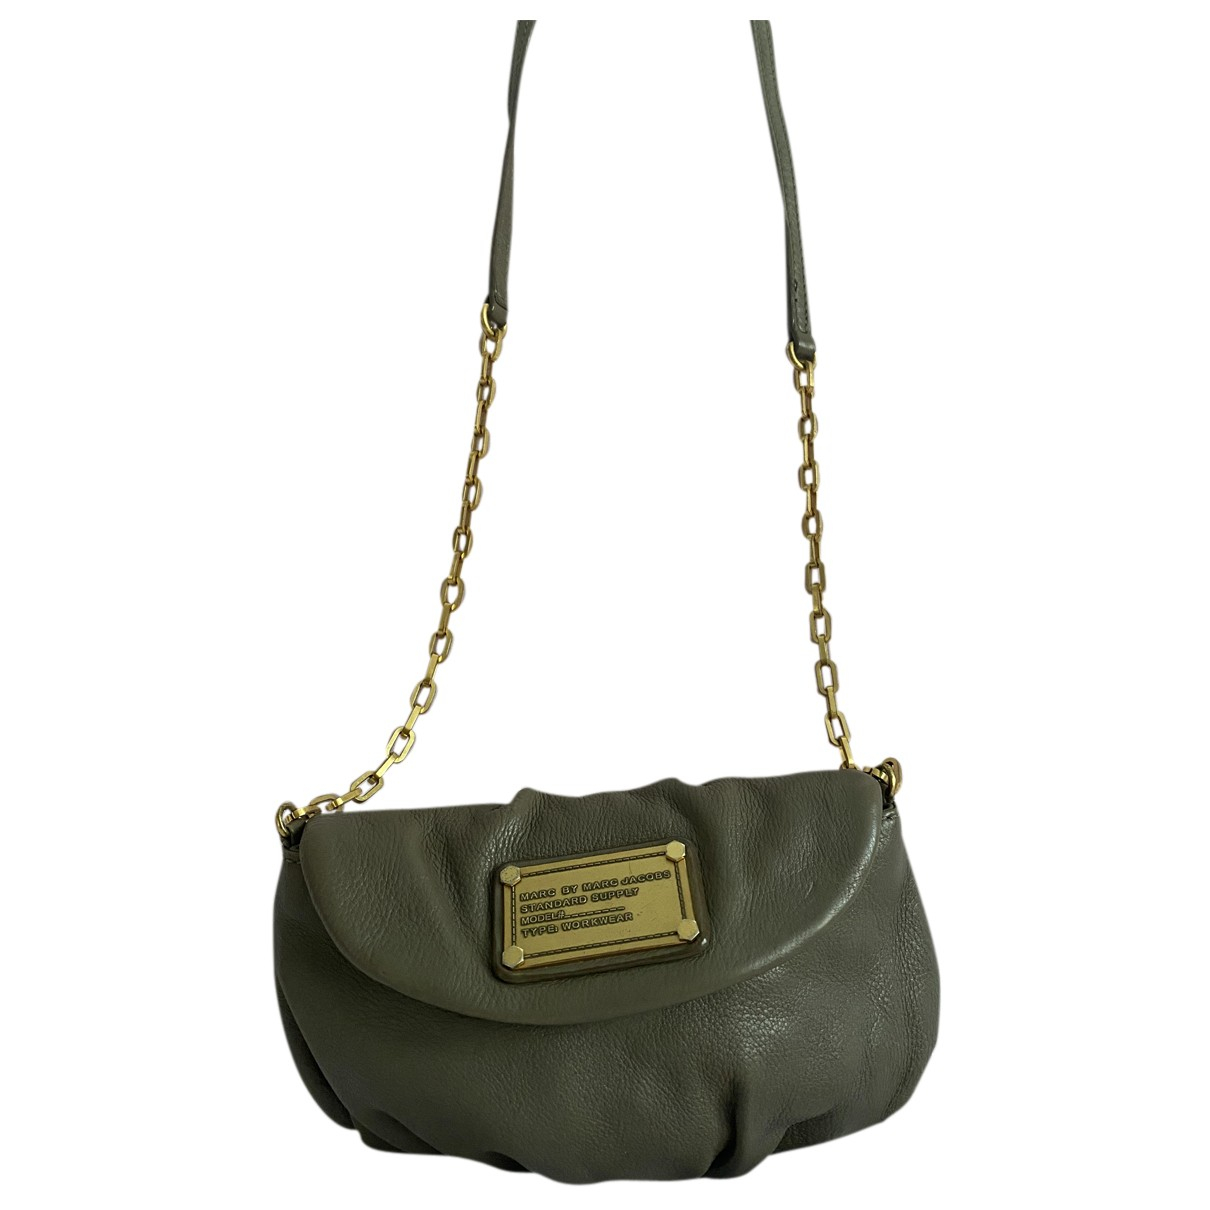 Marc By Marc Jacobs N Khaki Leather handbag for Women N